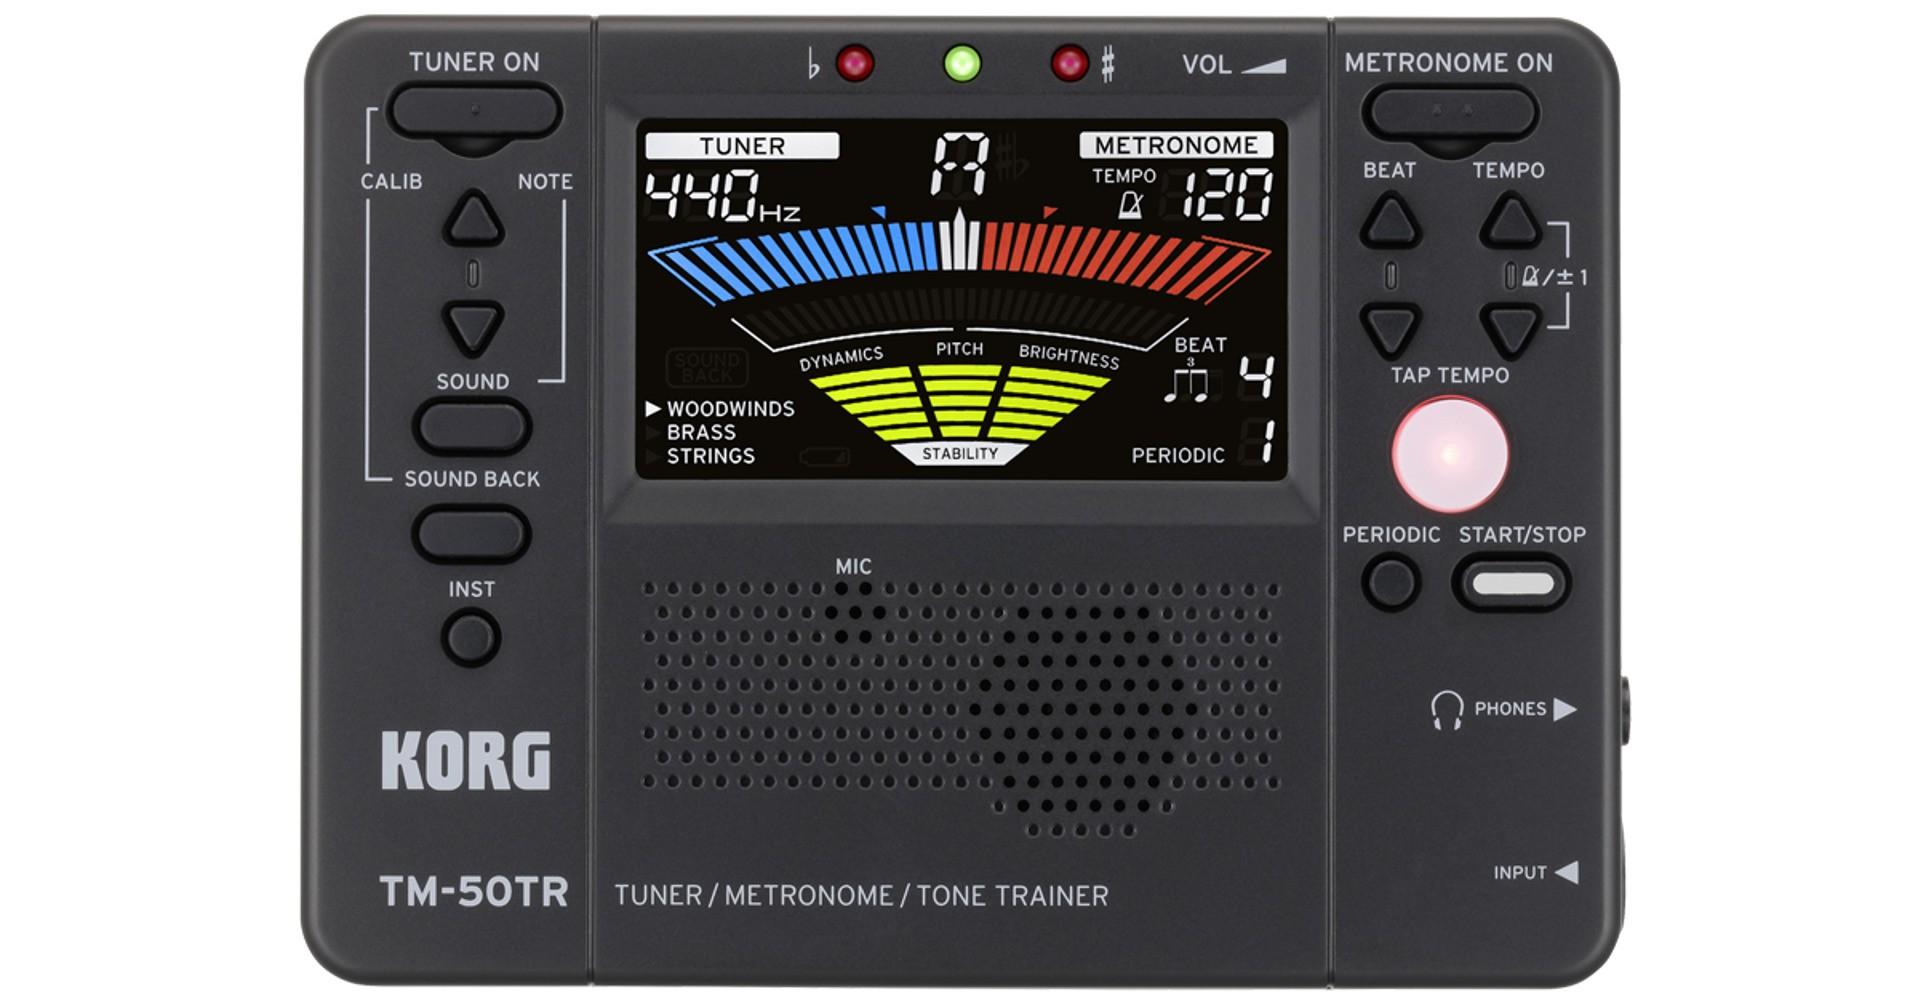 Korg TM50TR Tone Trainer Metronome Tuner $30 + free s/h